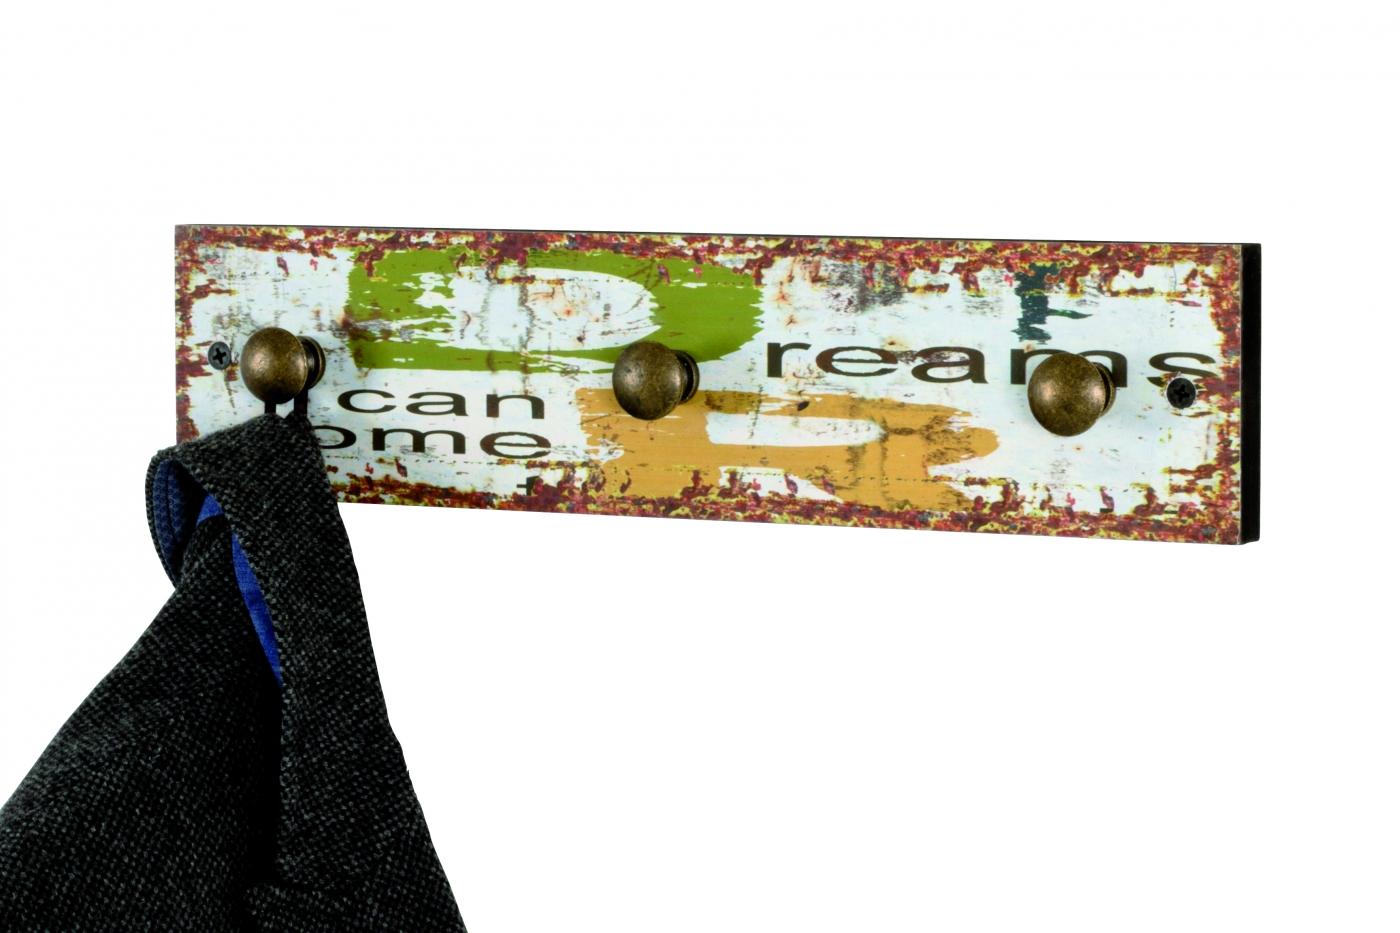 Nástěnný věšák Luzia, 34 cm